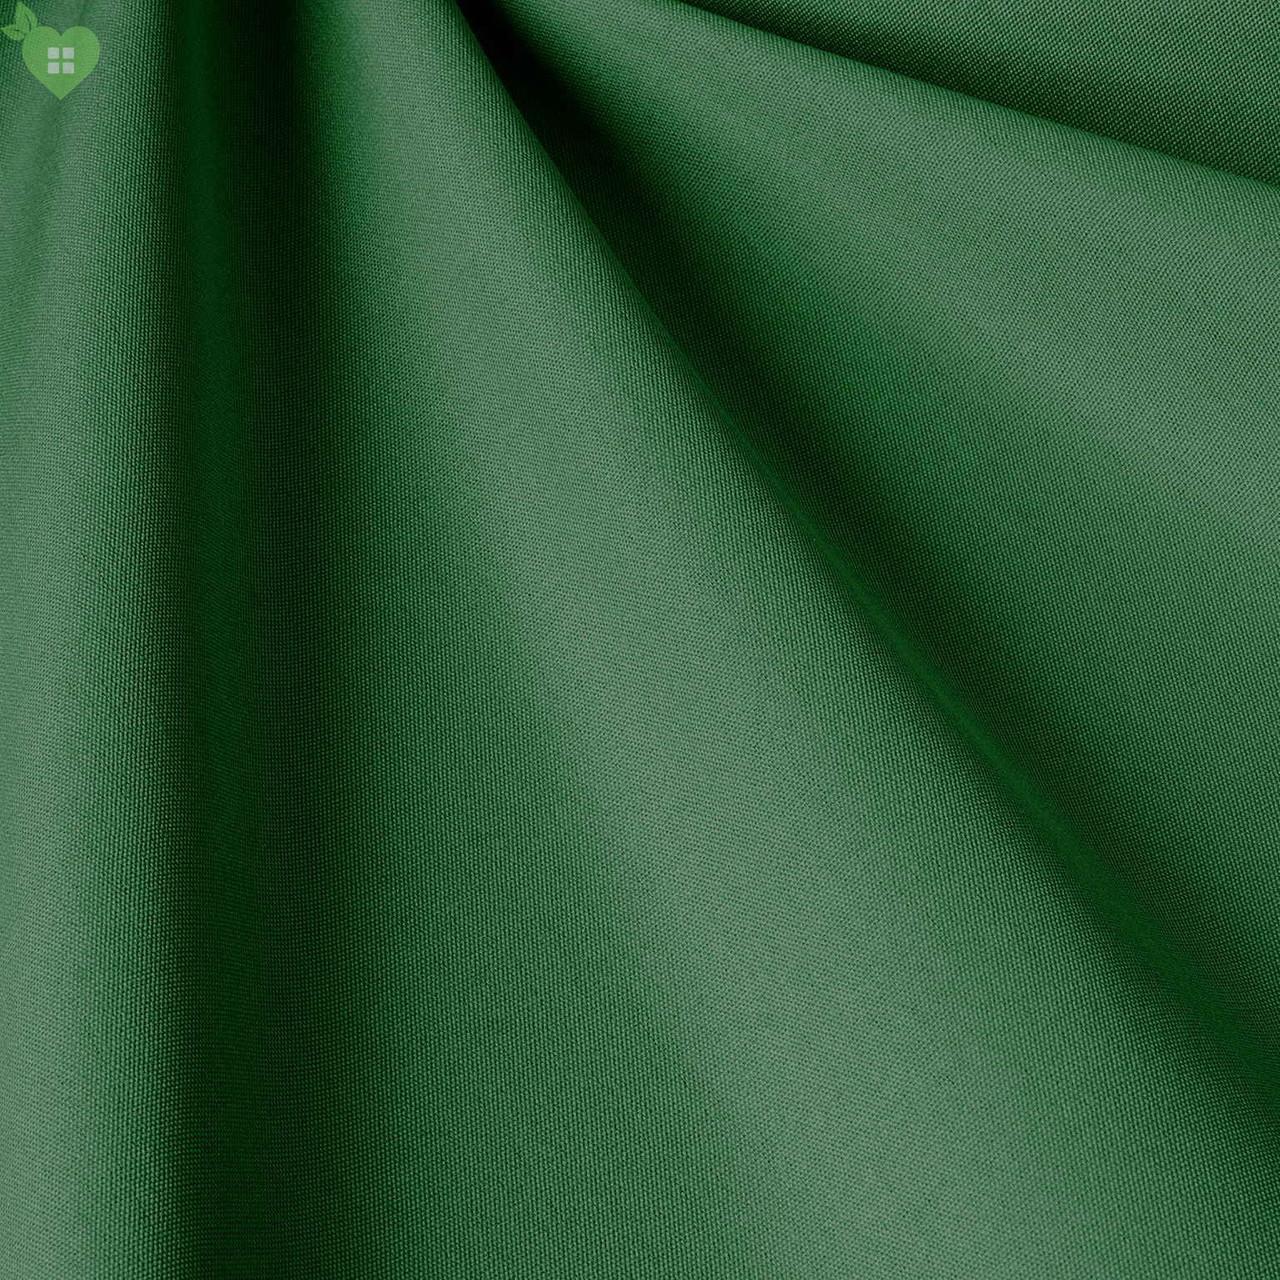 Ткань для улицы: Дралон (Outdoor) 400333v30